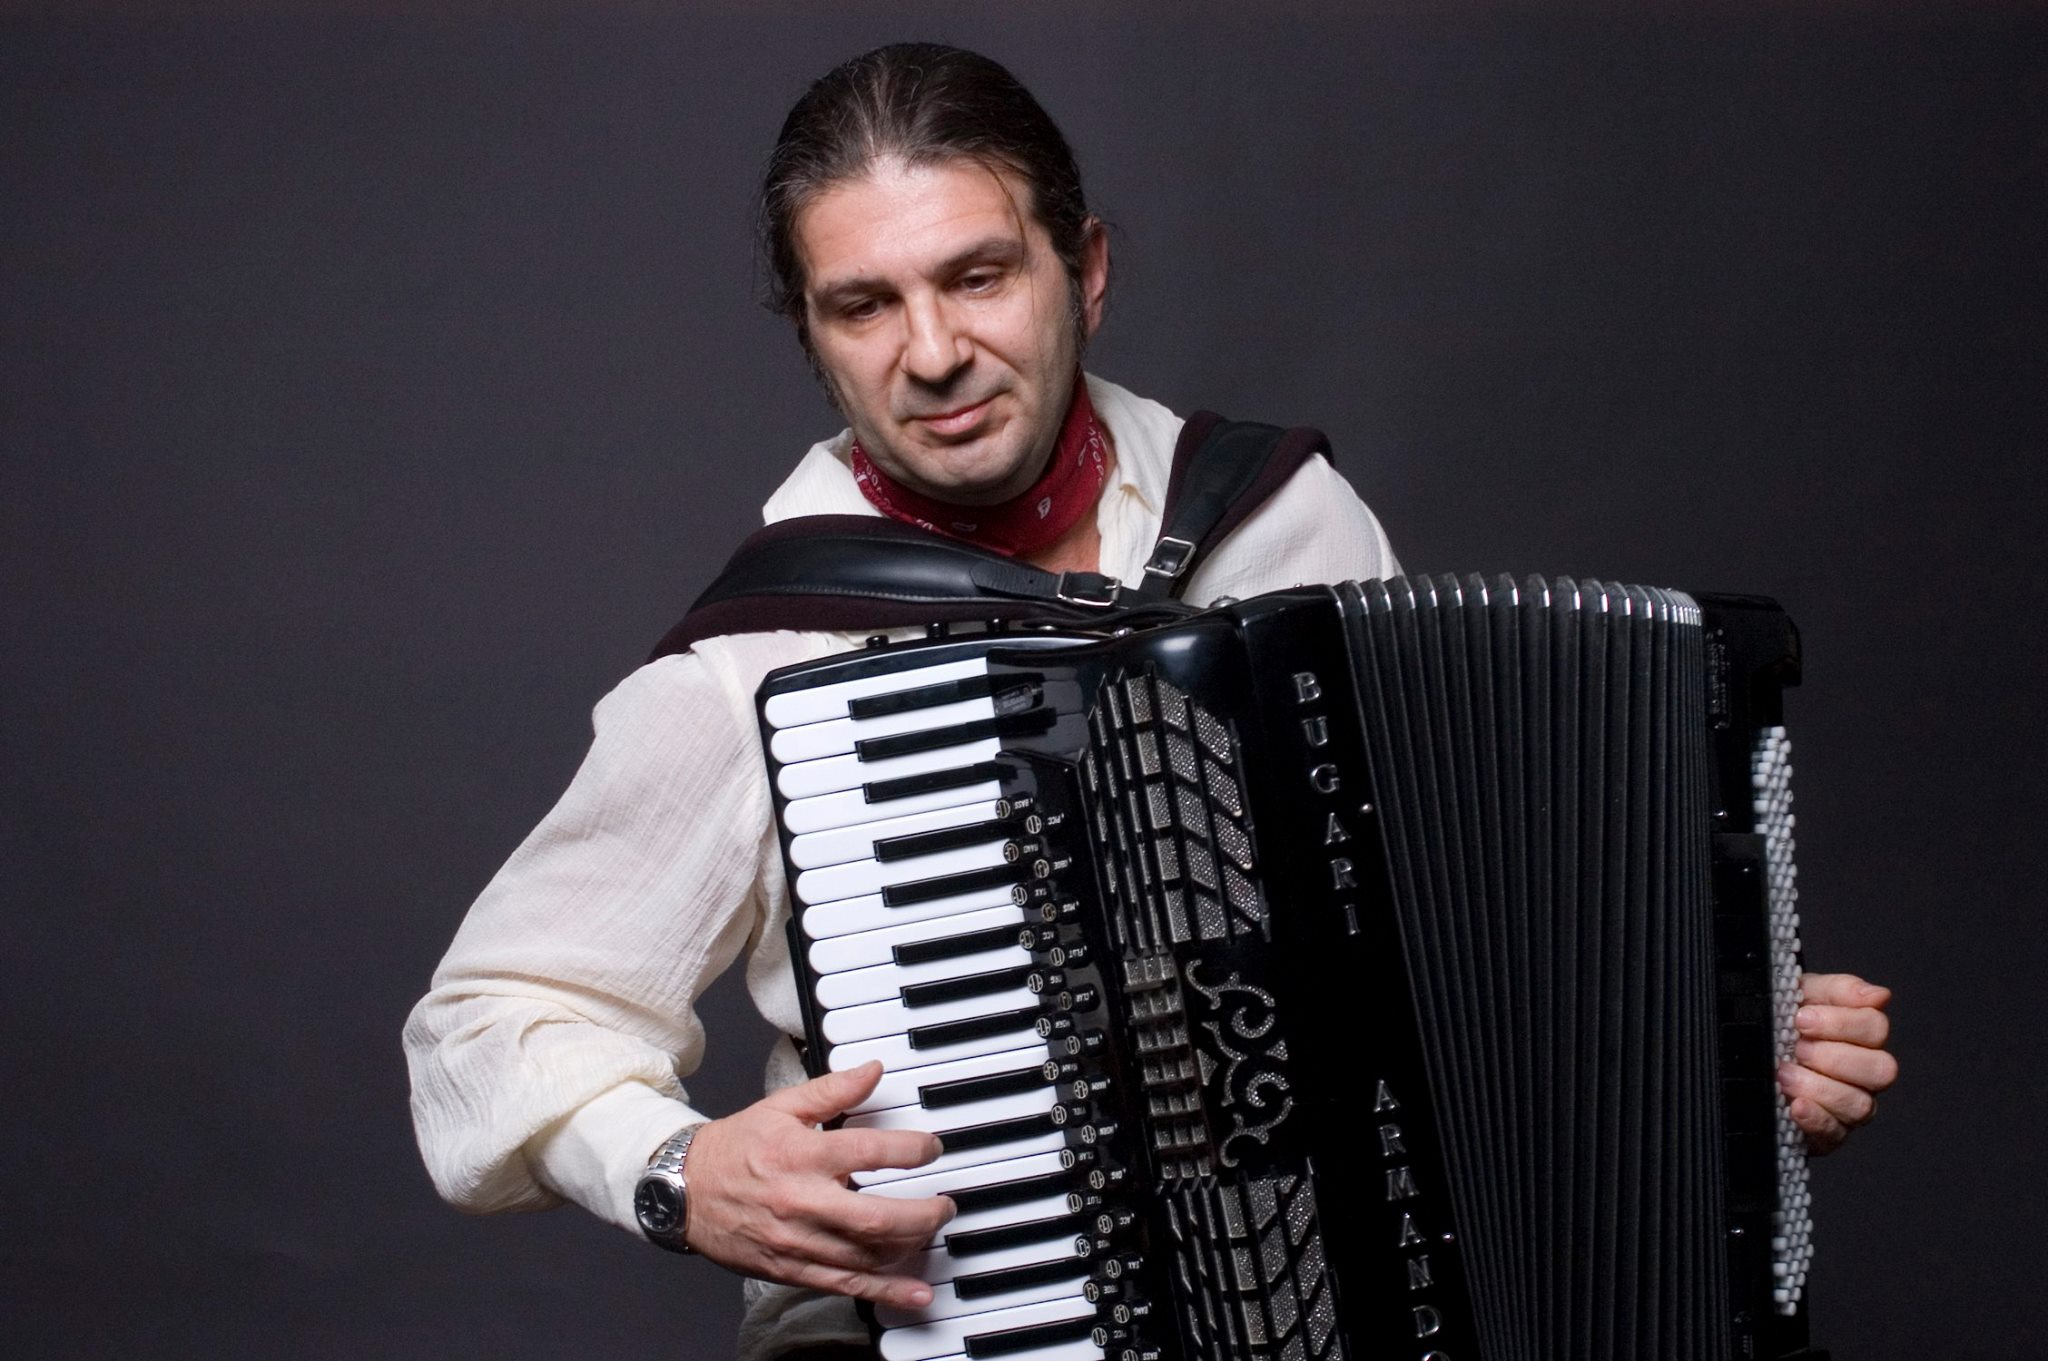 Roberto Cassan